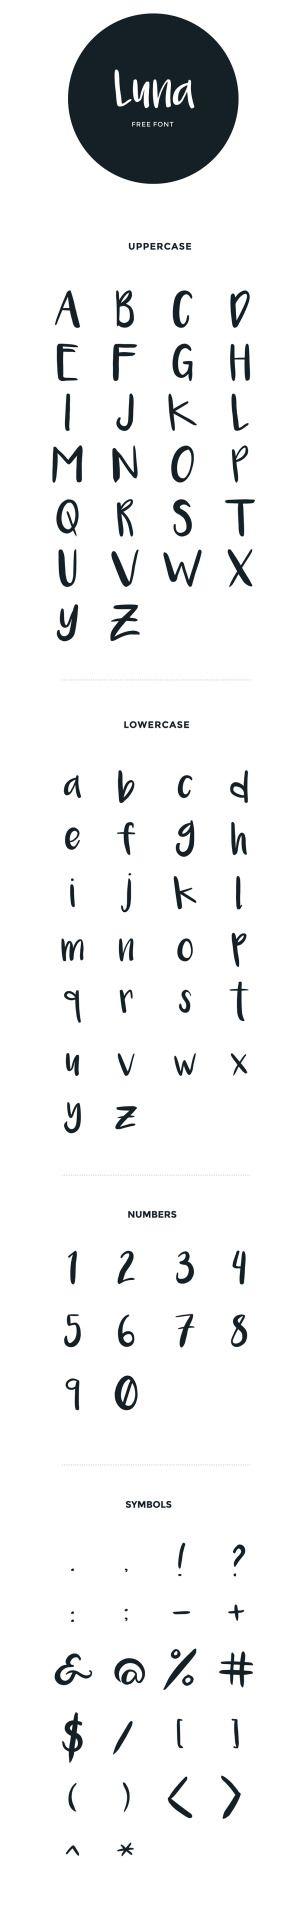 Fonts i like fonts i have fonts i want luna handwritten fonts i like fonts i have fonts i want luna handwritten brush thecheapjerseys Choice Image